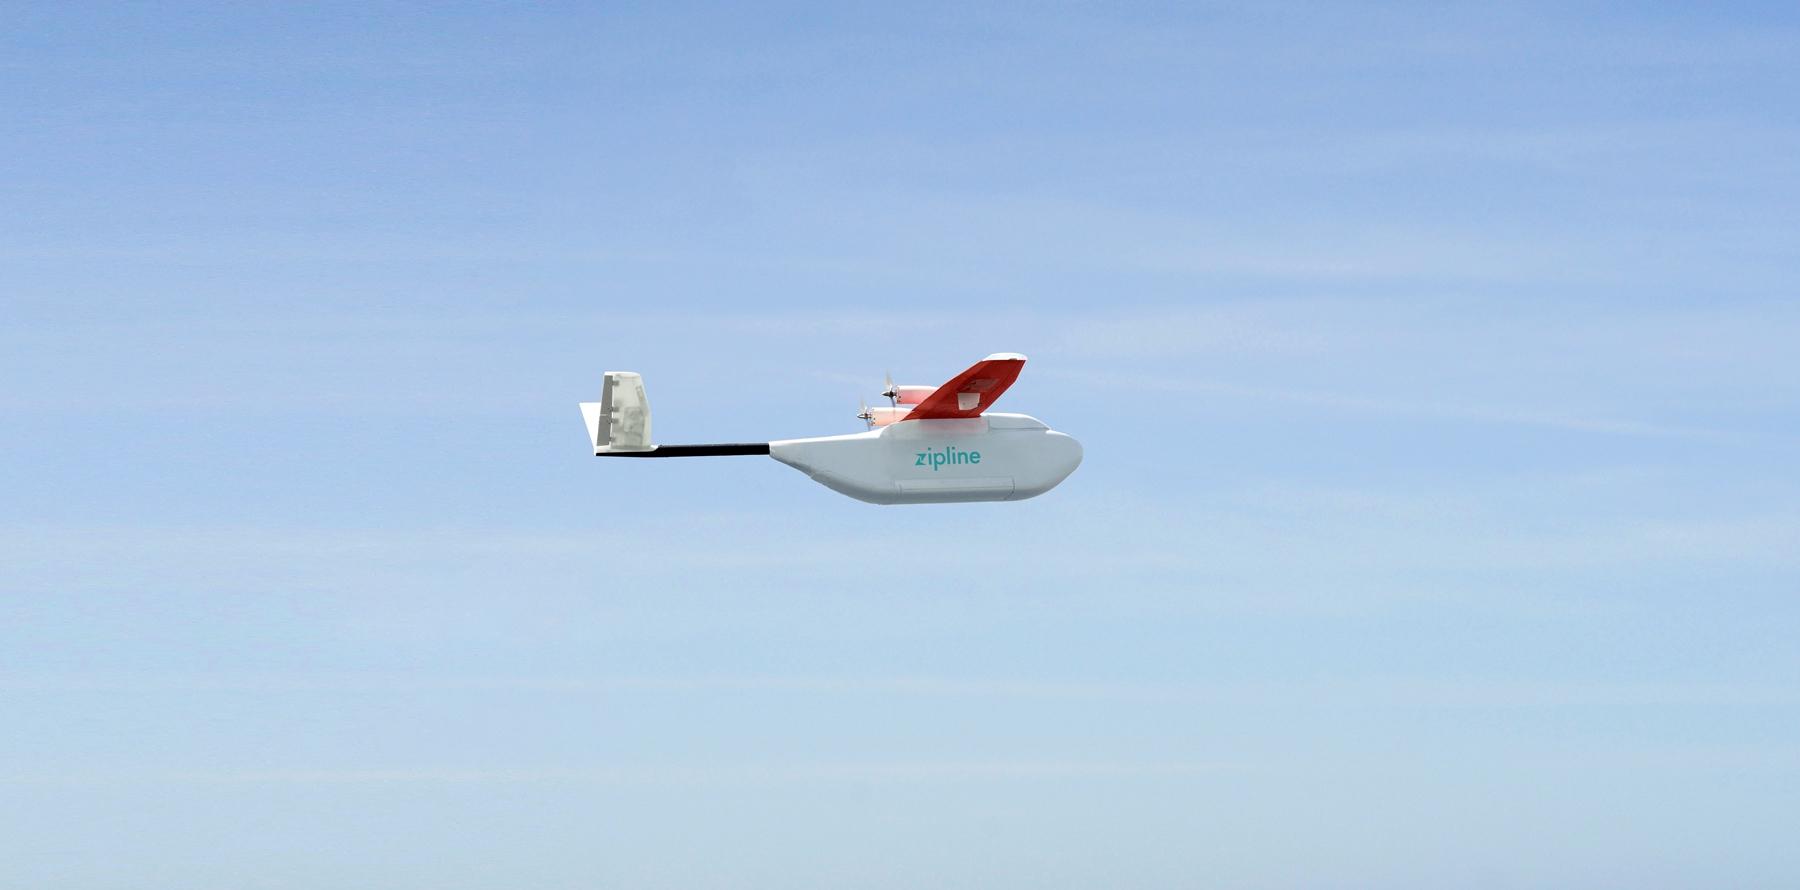 A Zipline drone in action